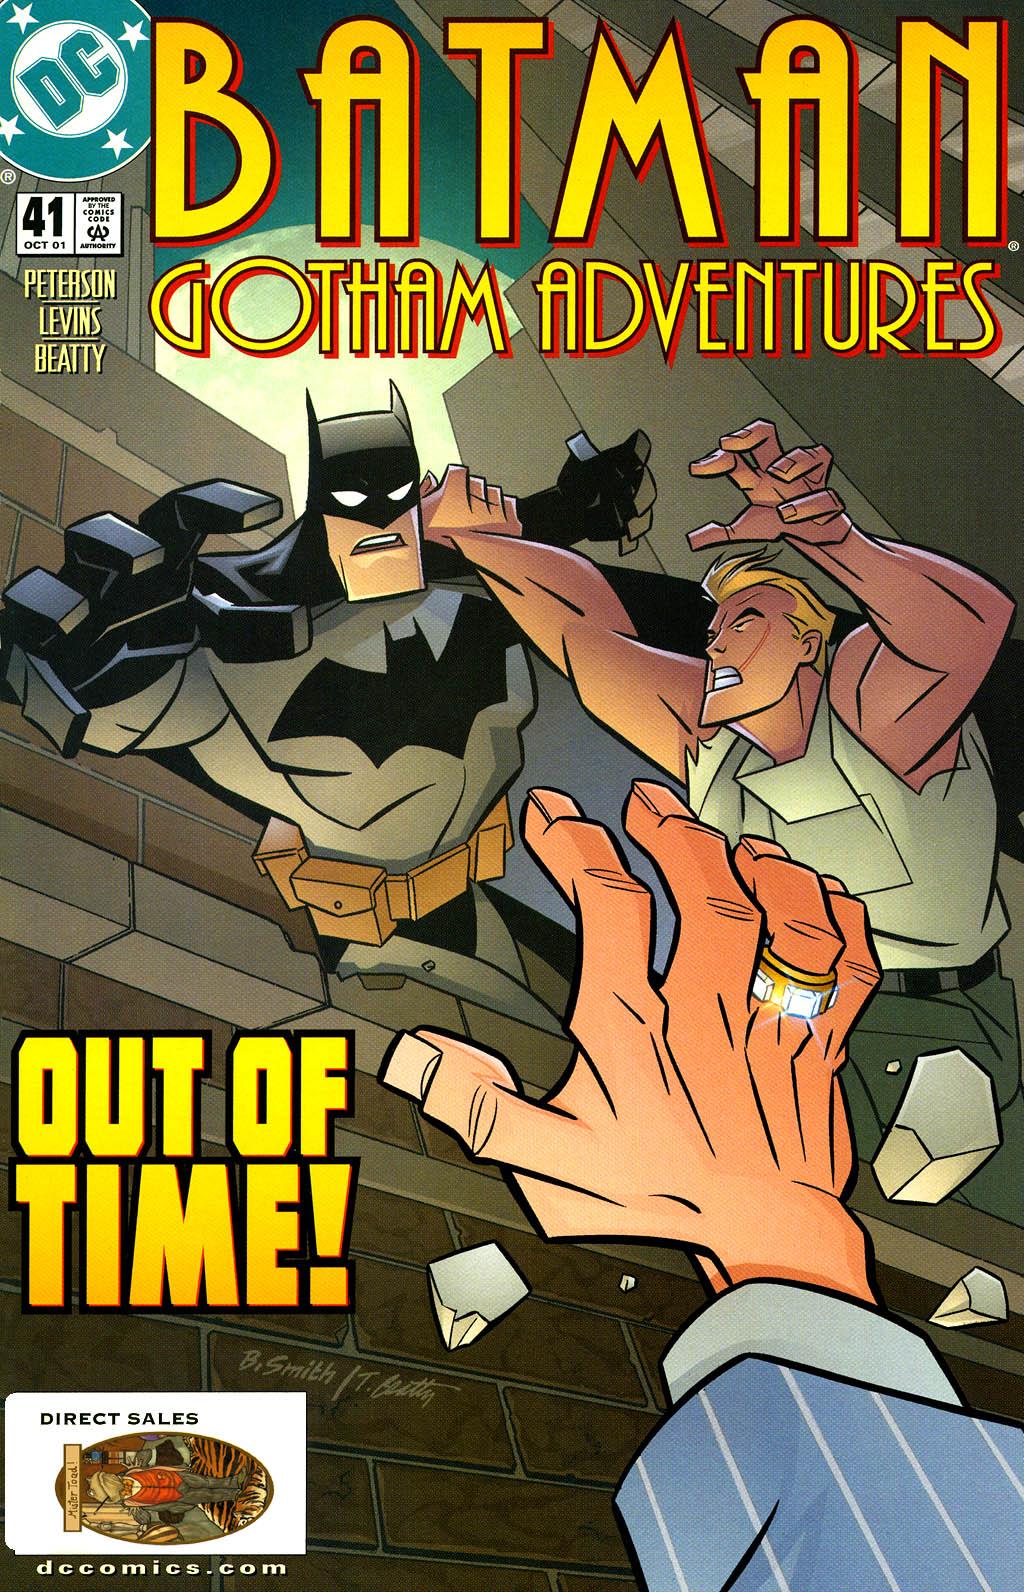 Batman: Gotham Adventures 41 Page 1